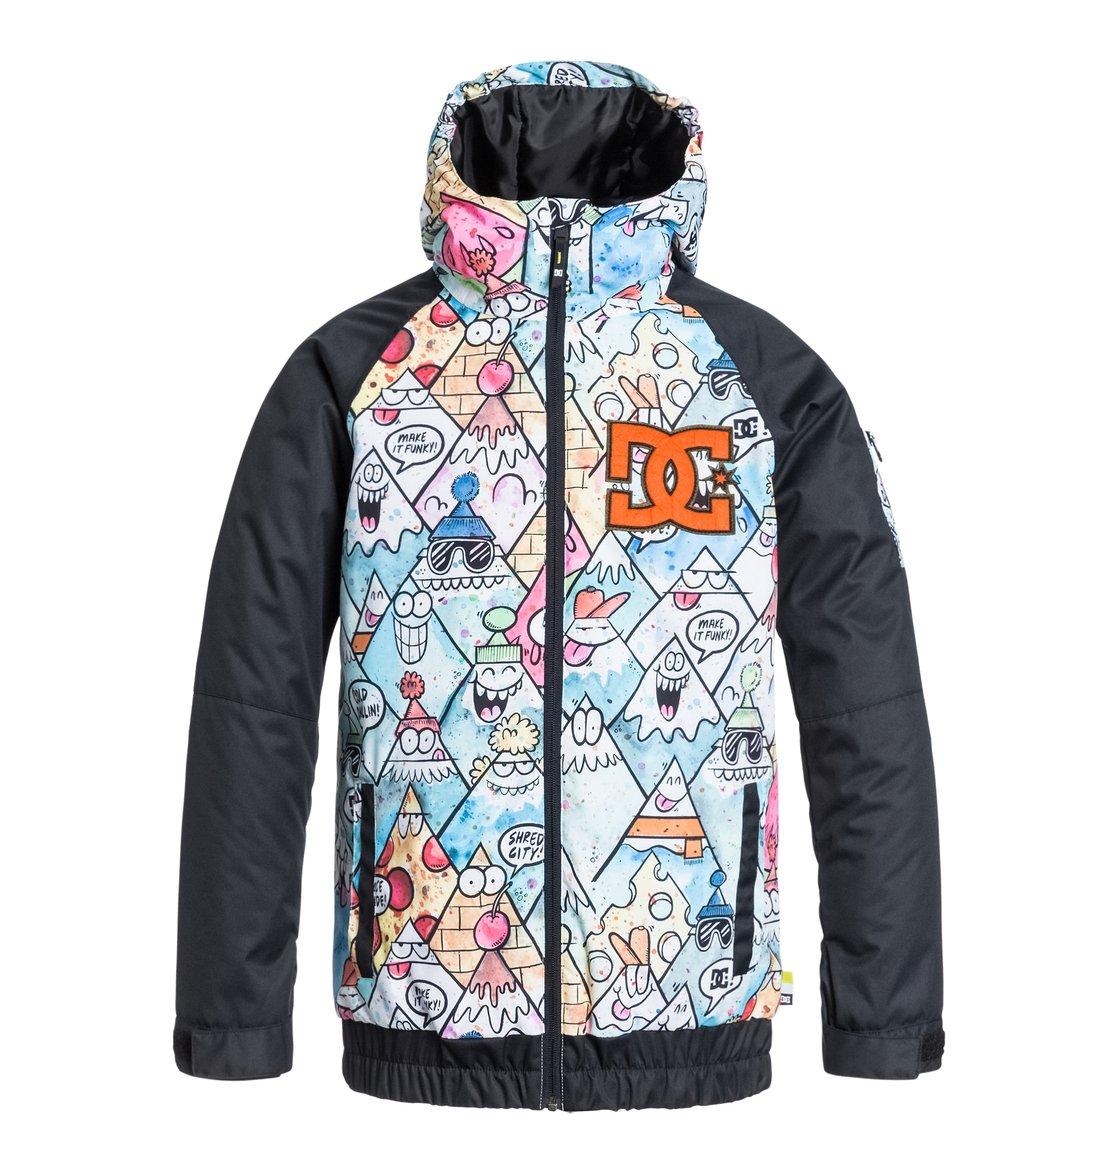 eeb417618 0 Troop - Snowboard Jacket EDBTJ03005 DC Shoes